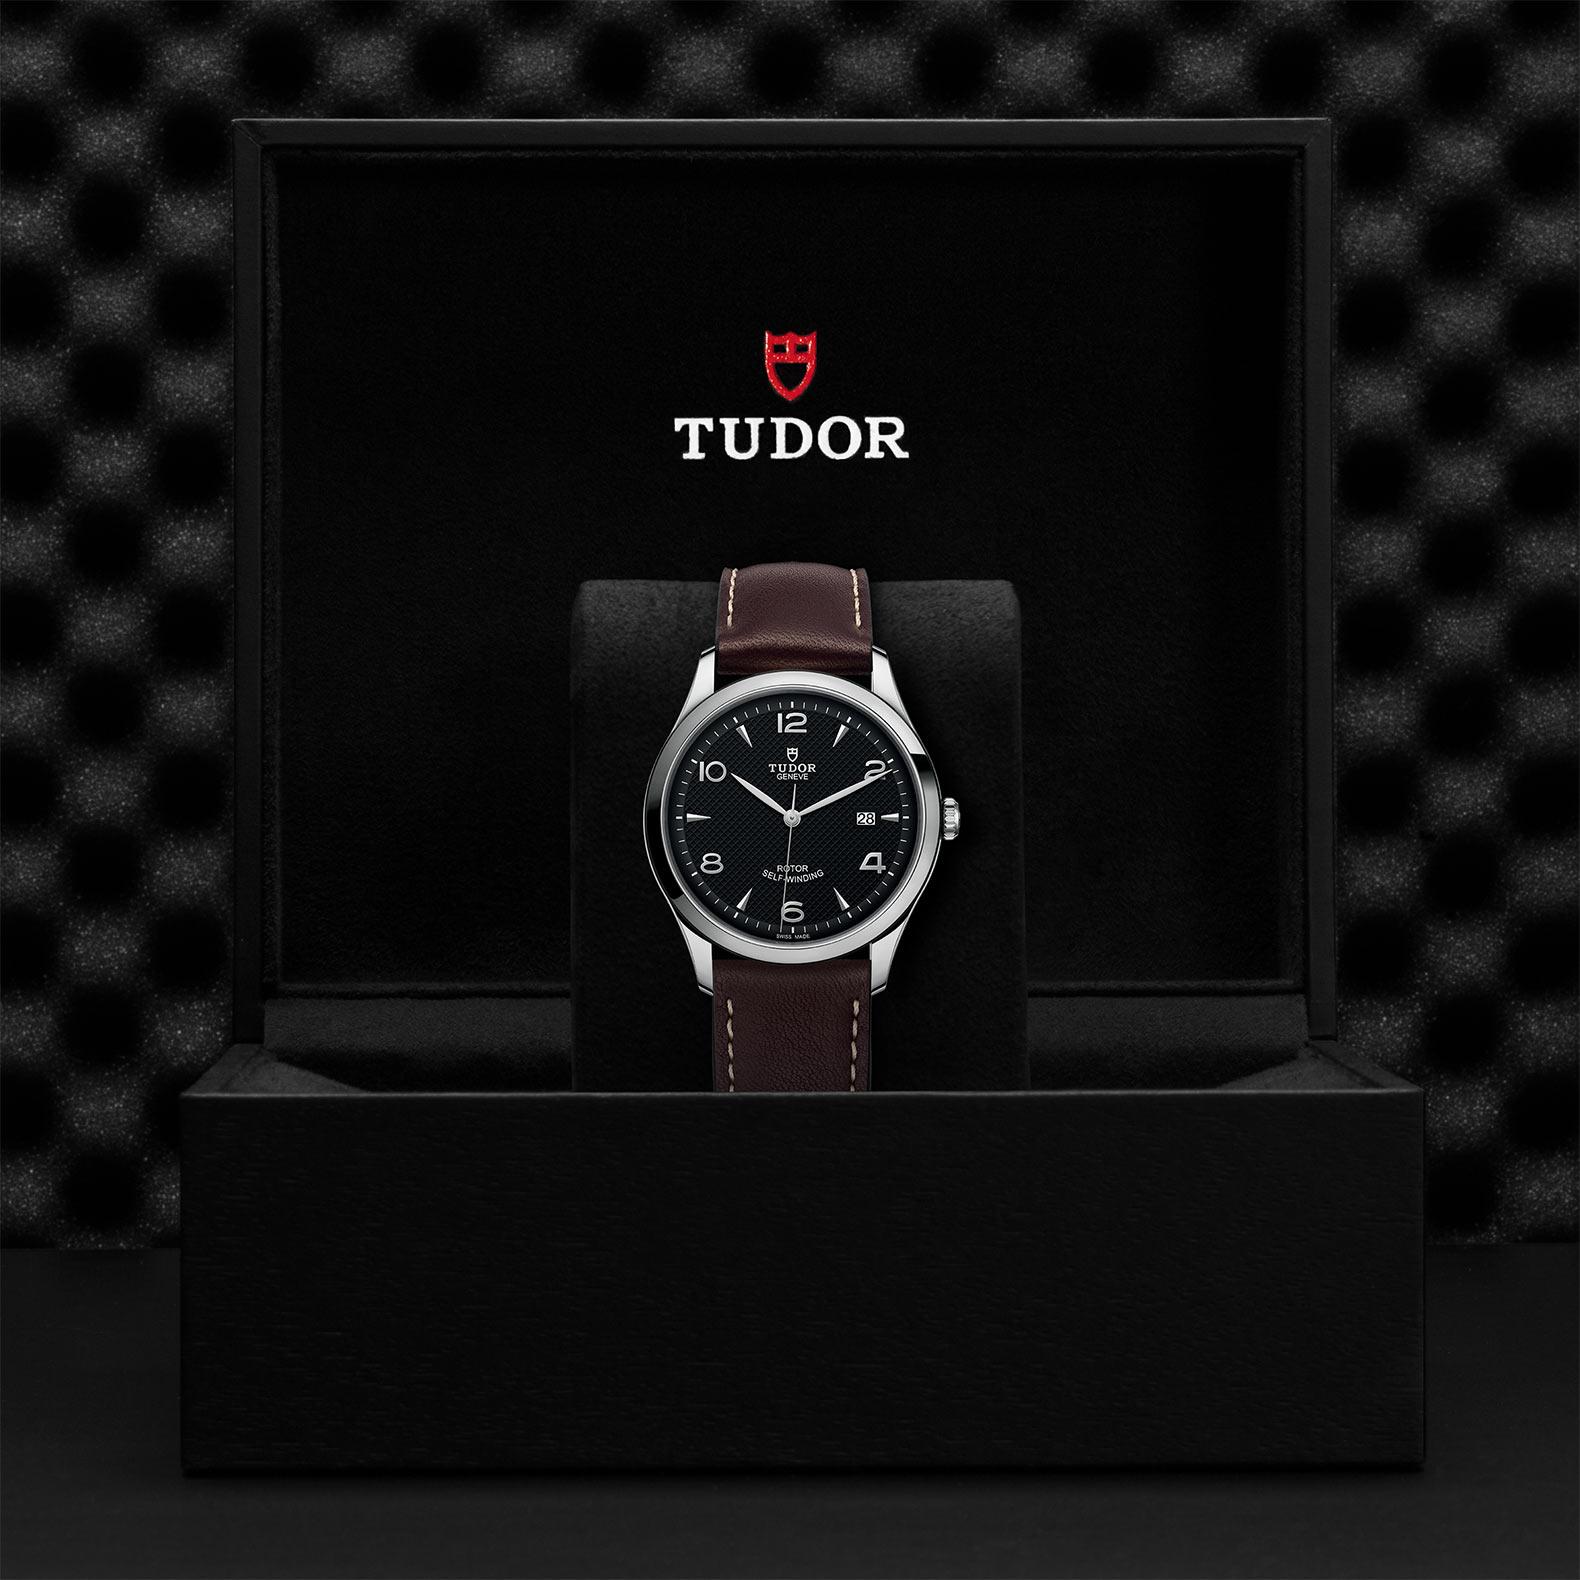 TUDOR 1926 - M91650-0008